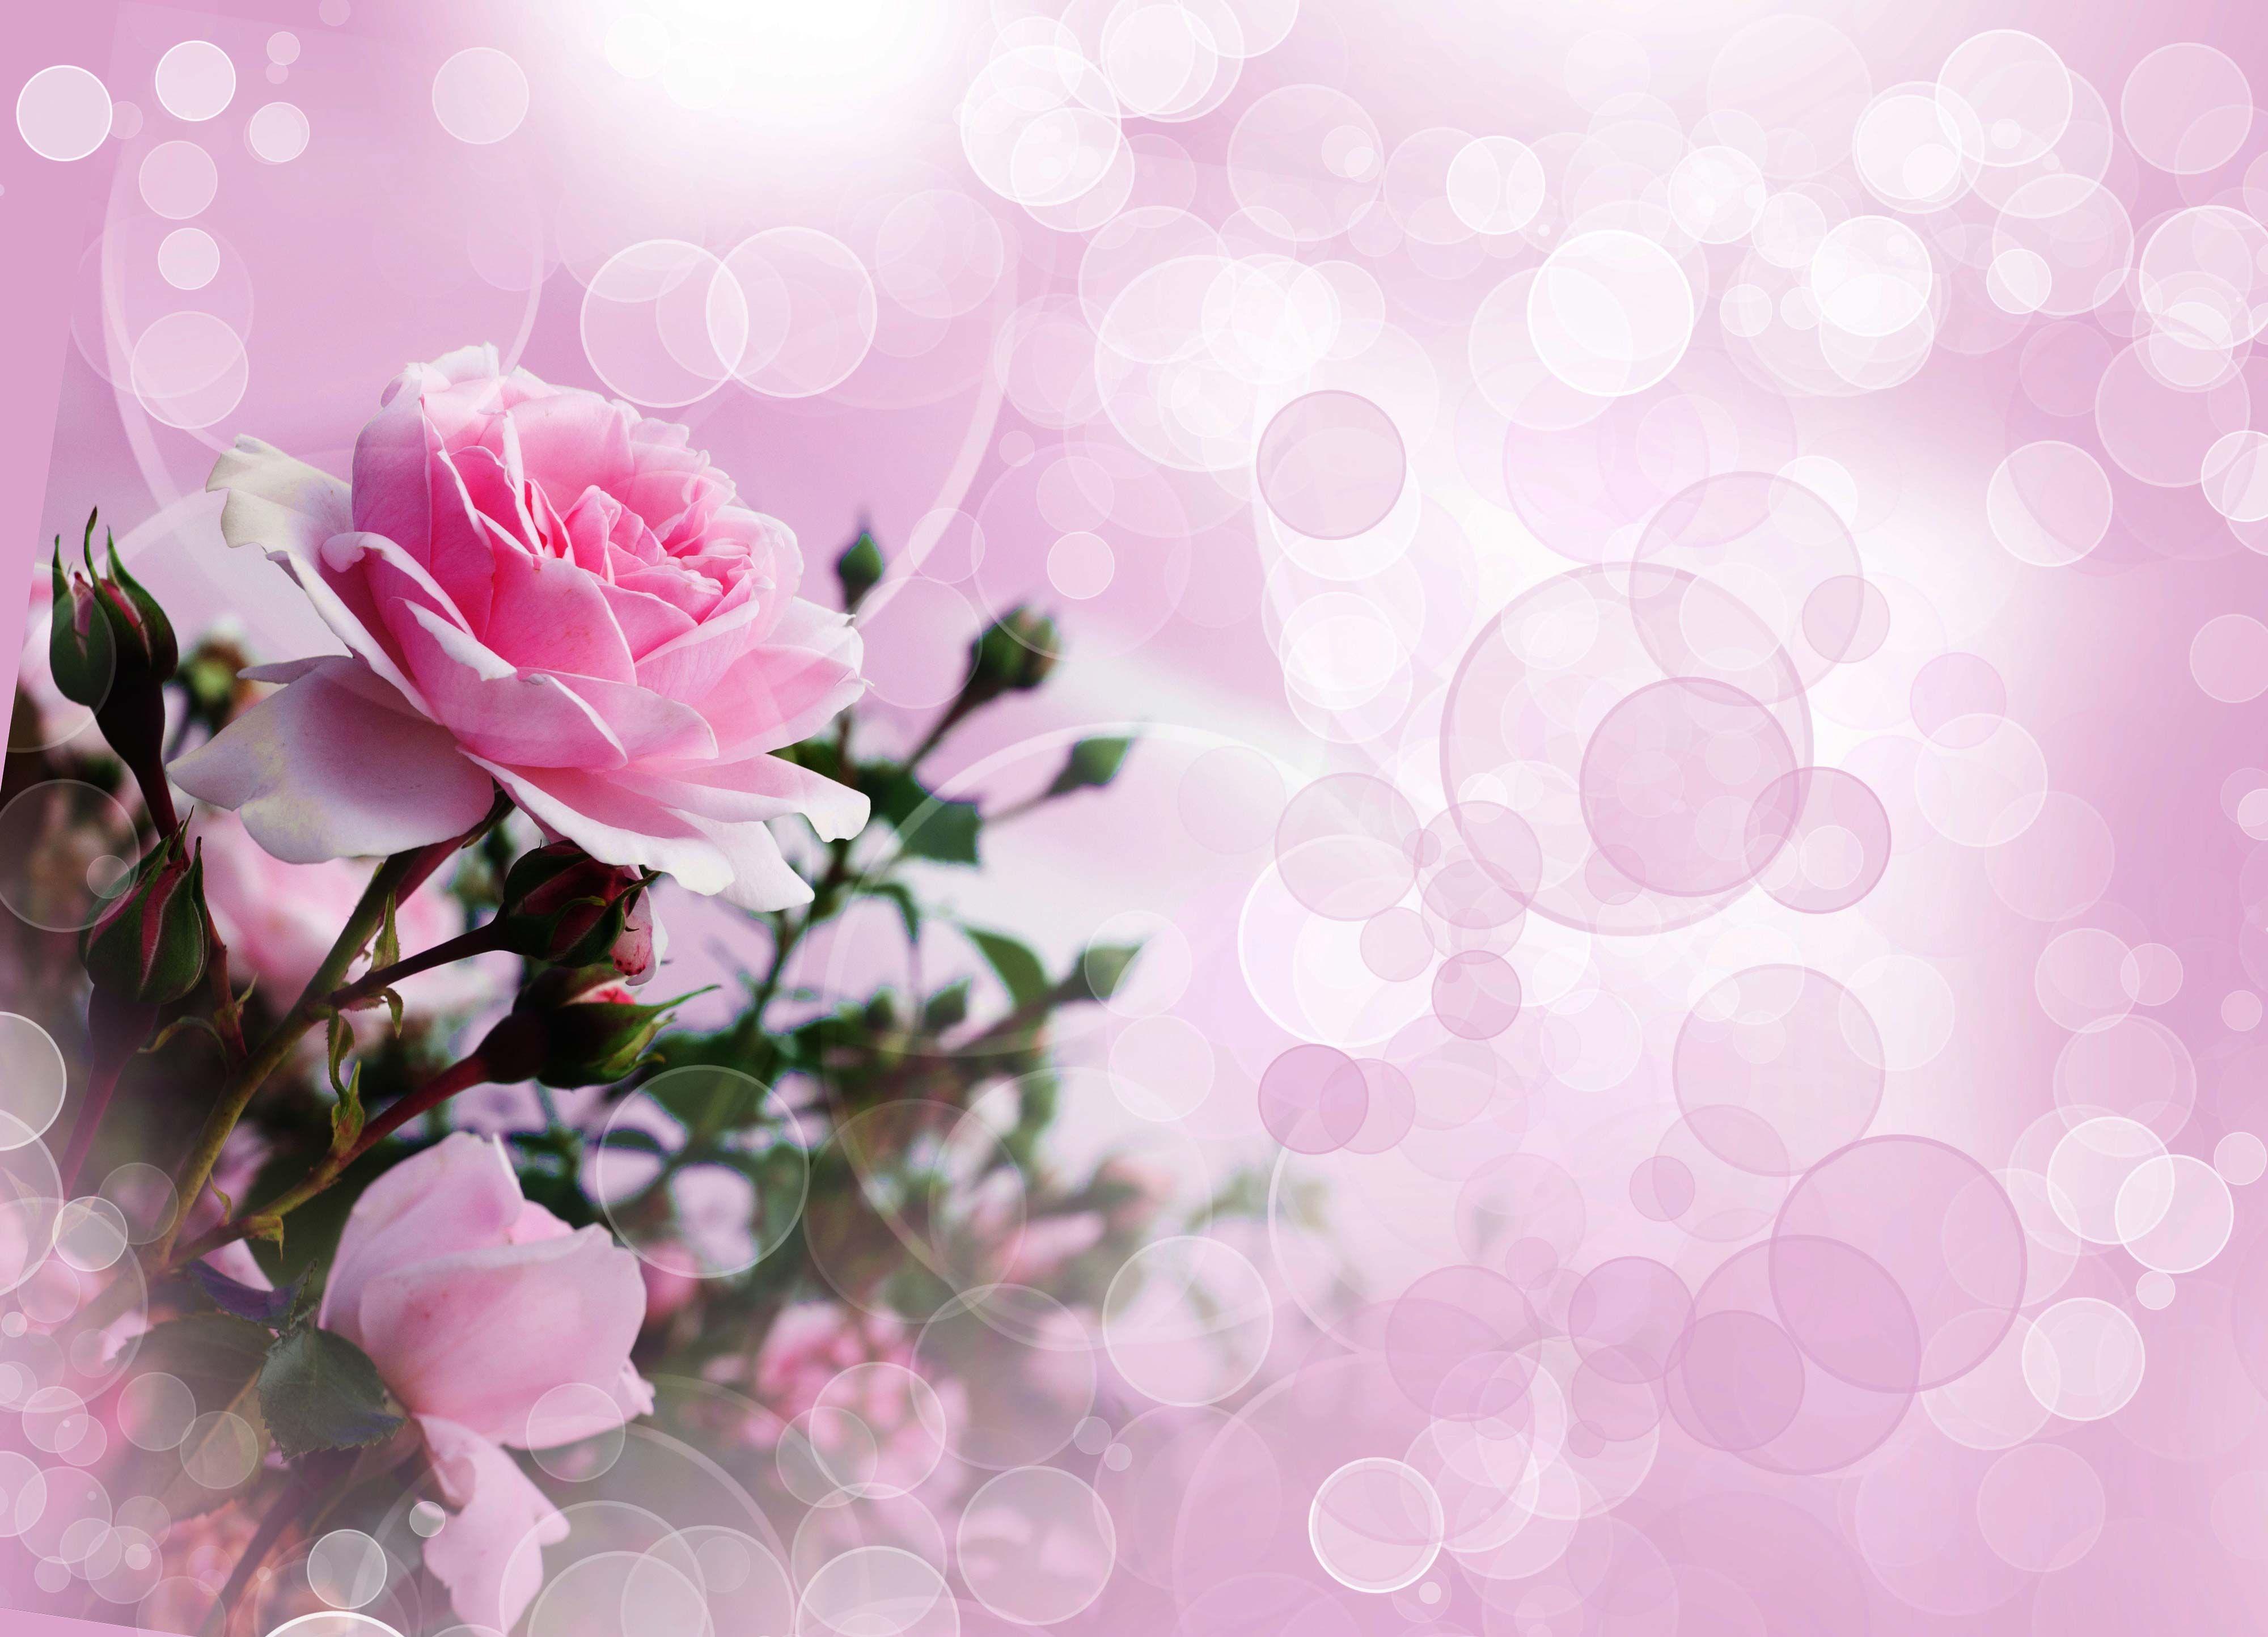 Pink Rose Wallpaper In 2020 Pink Rose Pictures Pink Roses